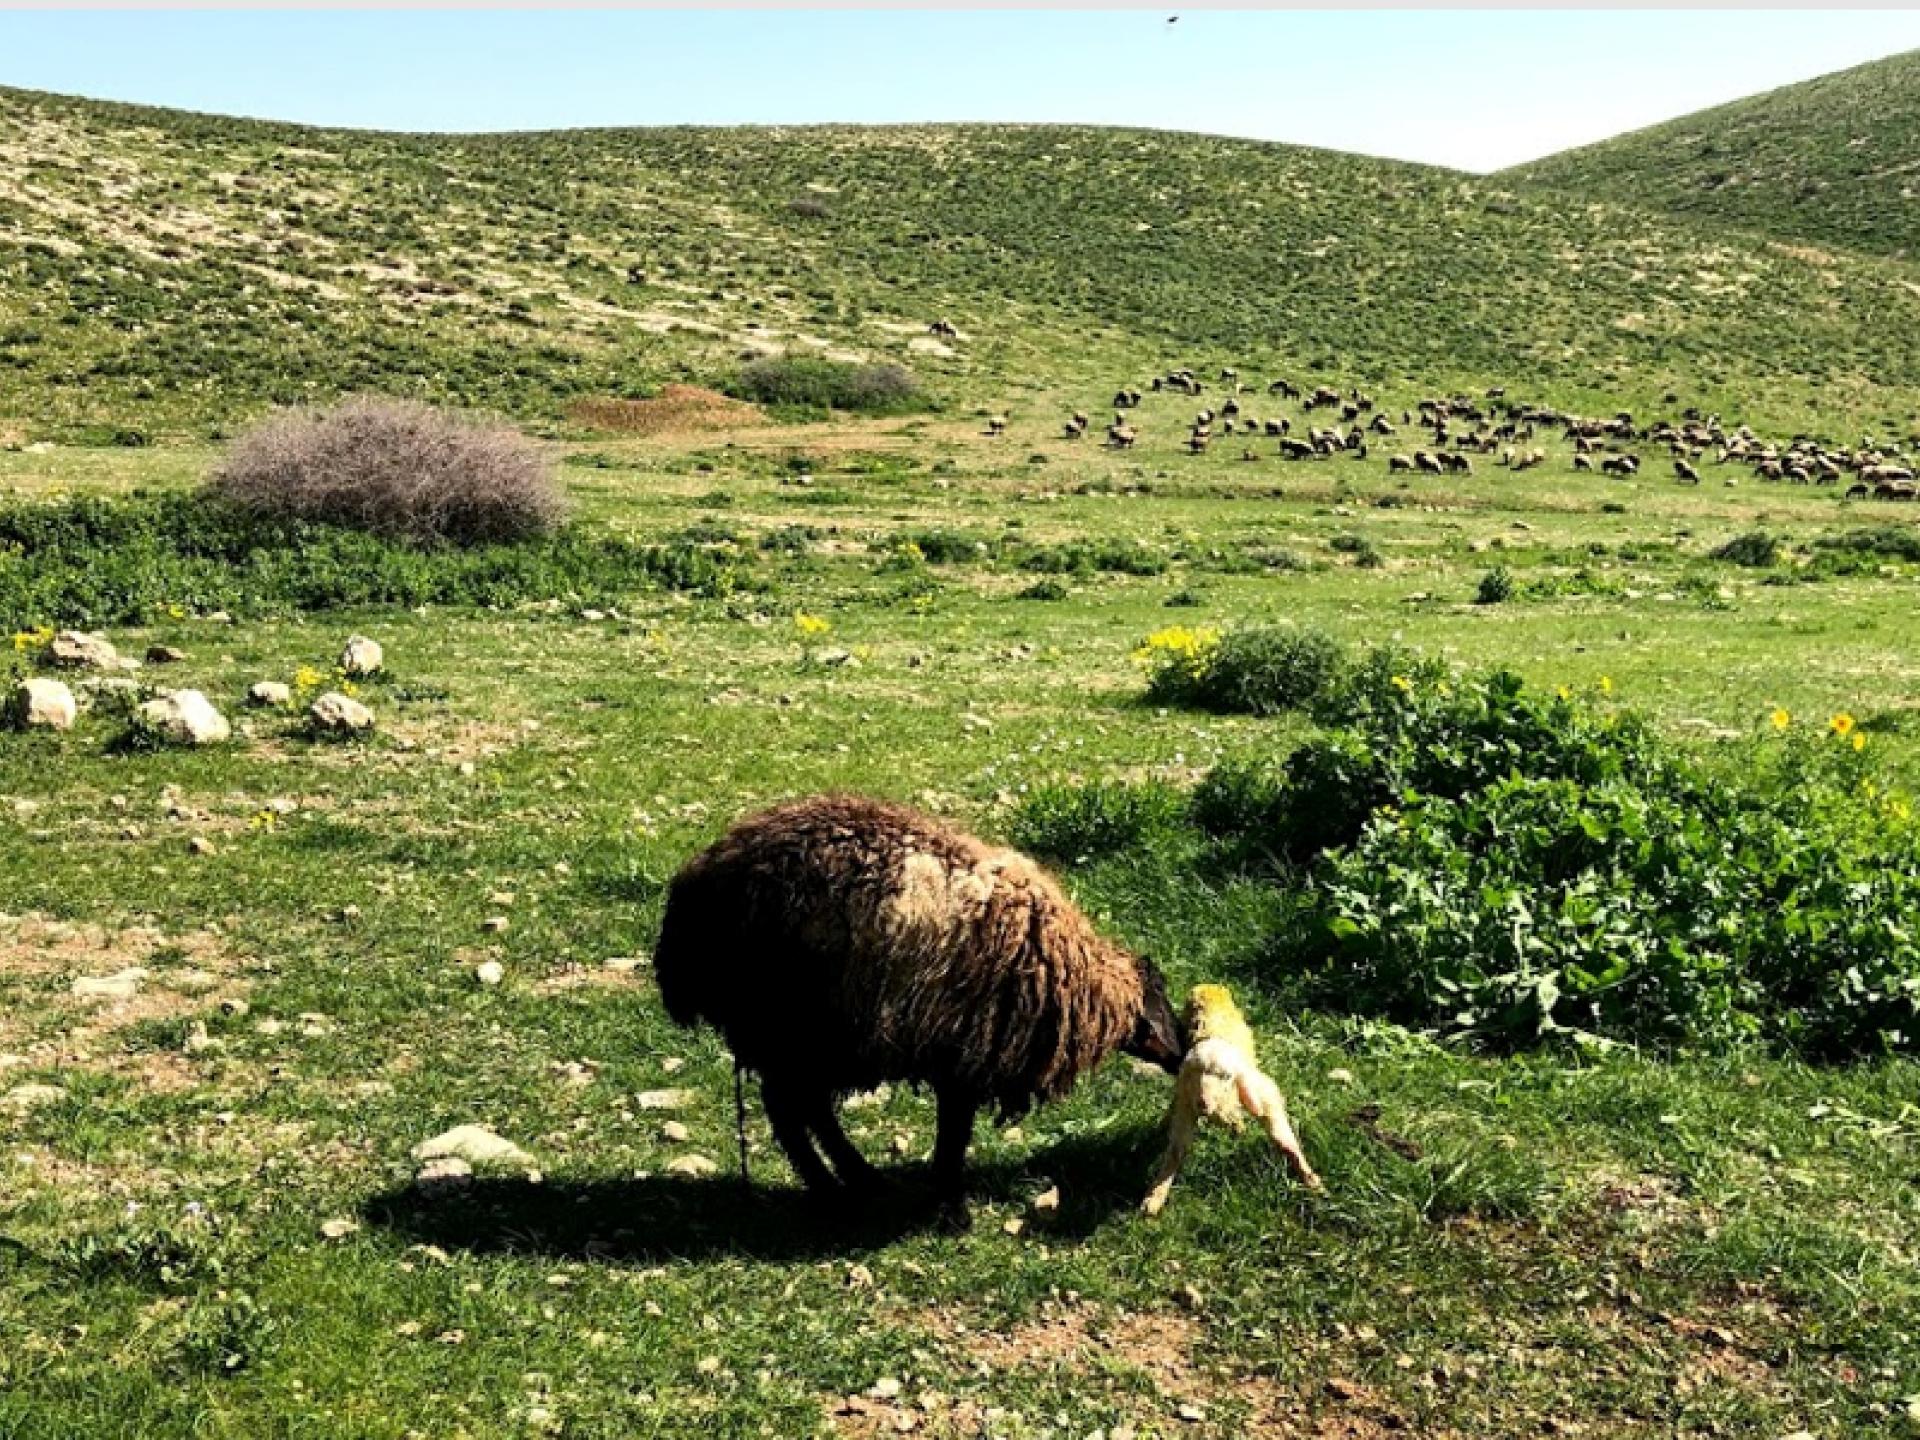 The sheep and the newborn lamb